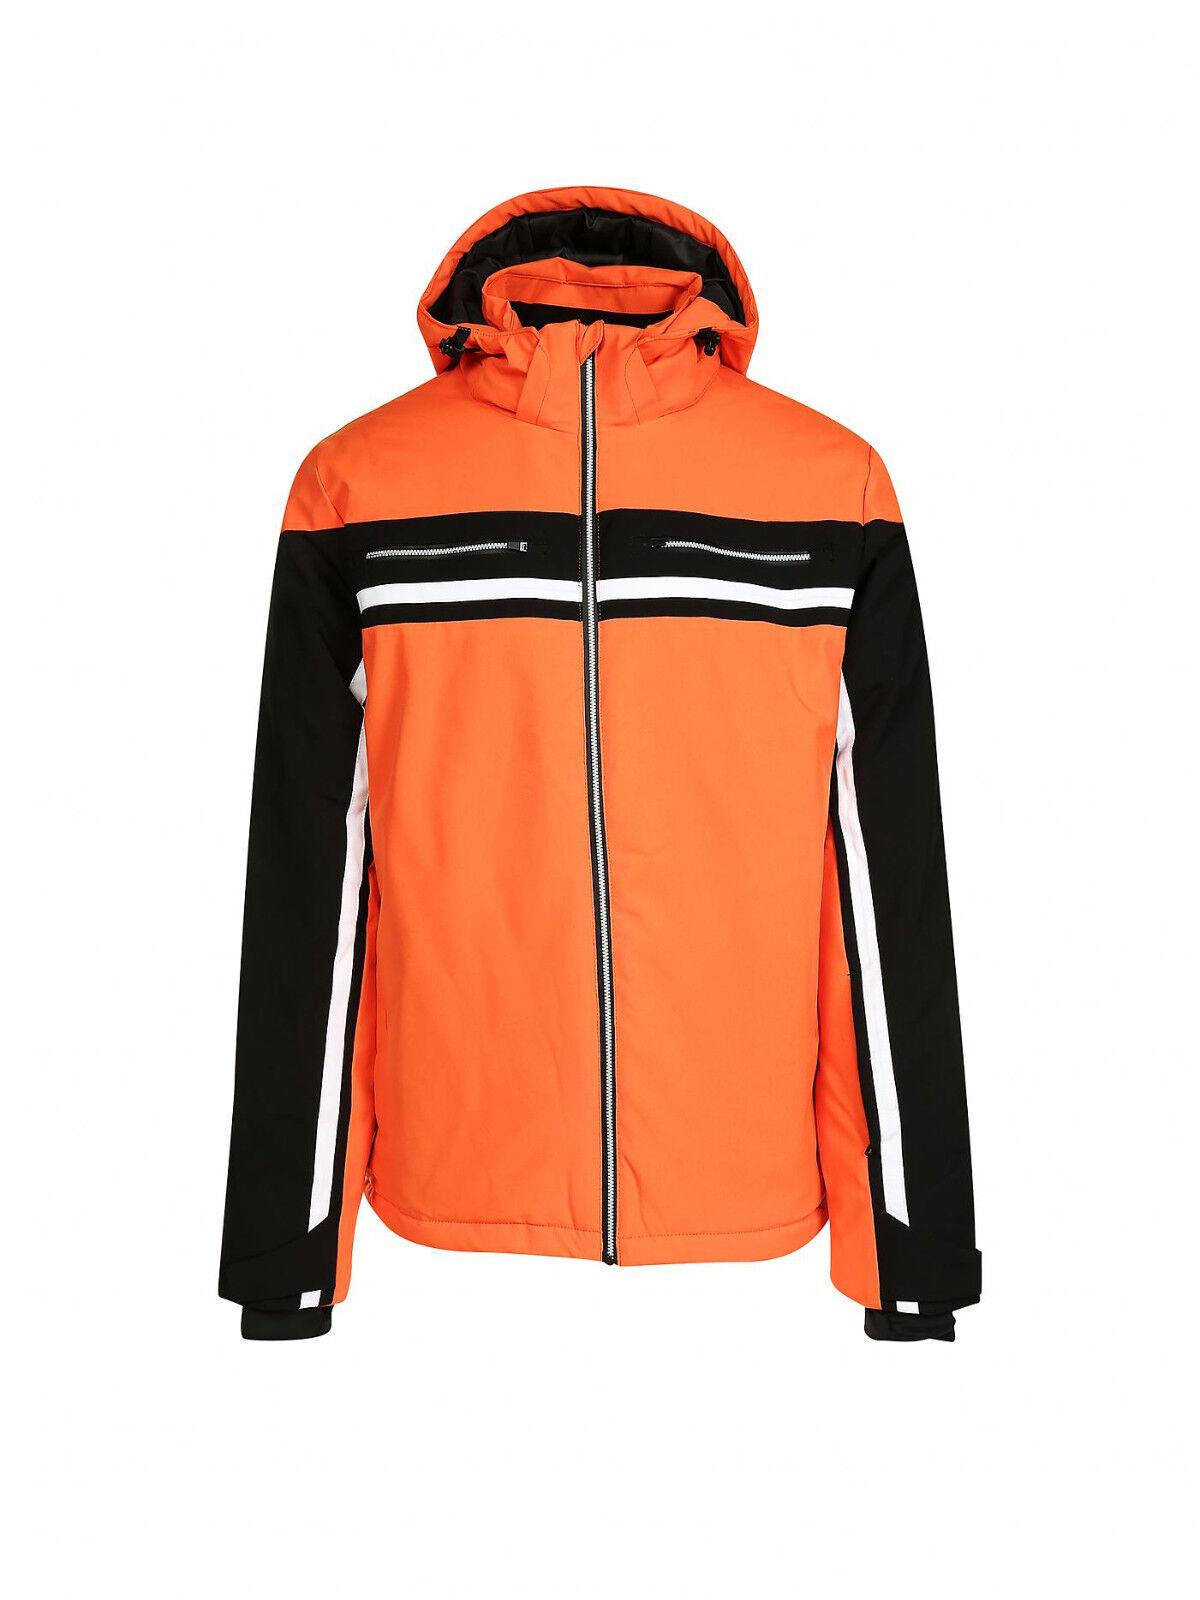 Gamakatsu Thermal Jacket Jacke XXL Zu Thermoanzug Thermal Suits Angelanzug Kva Anzüge Bekleidung